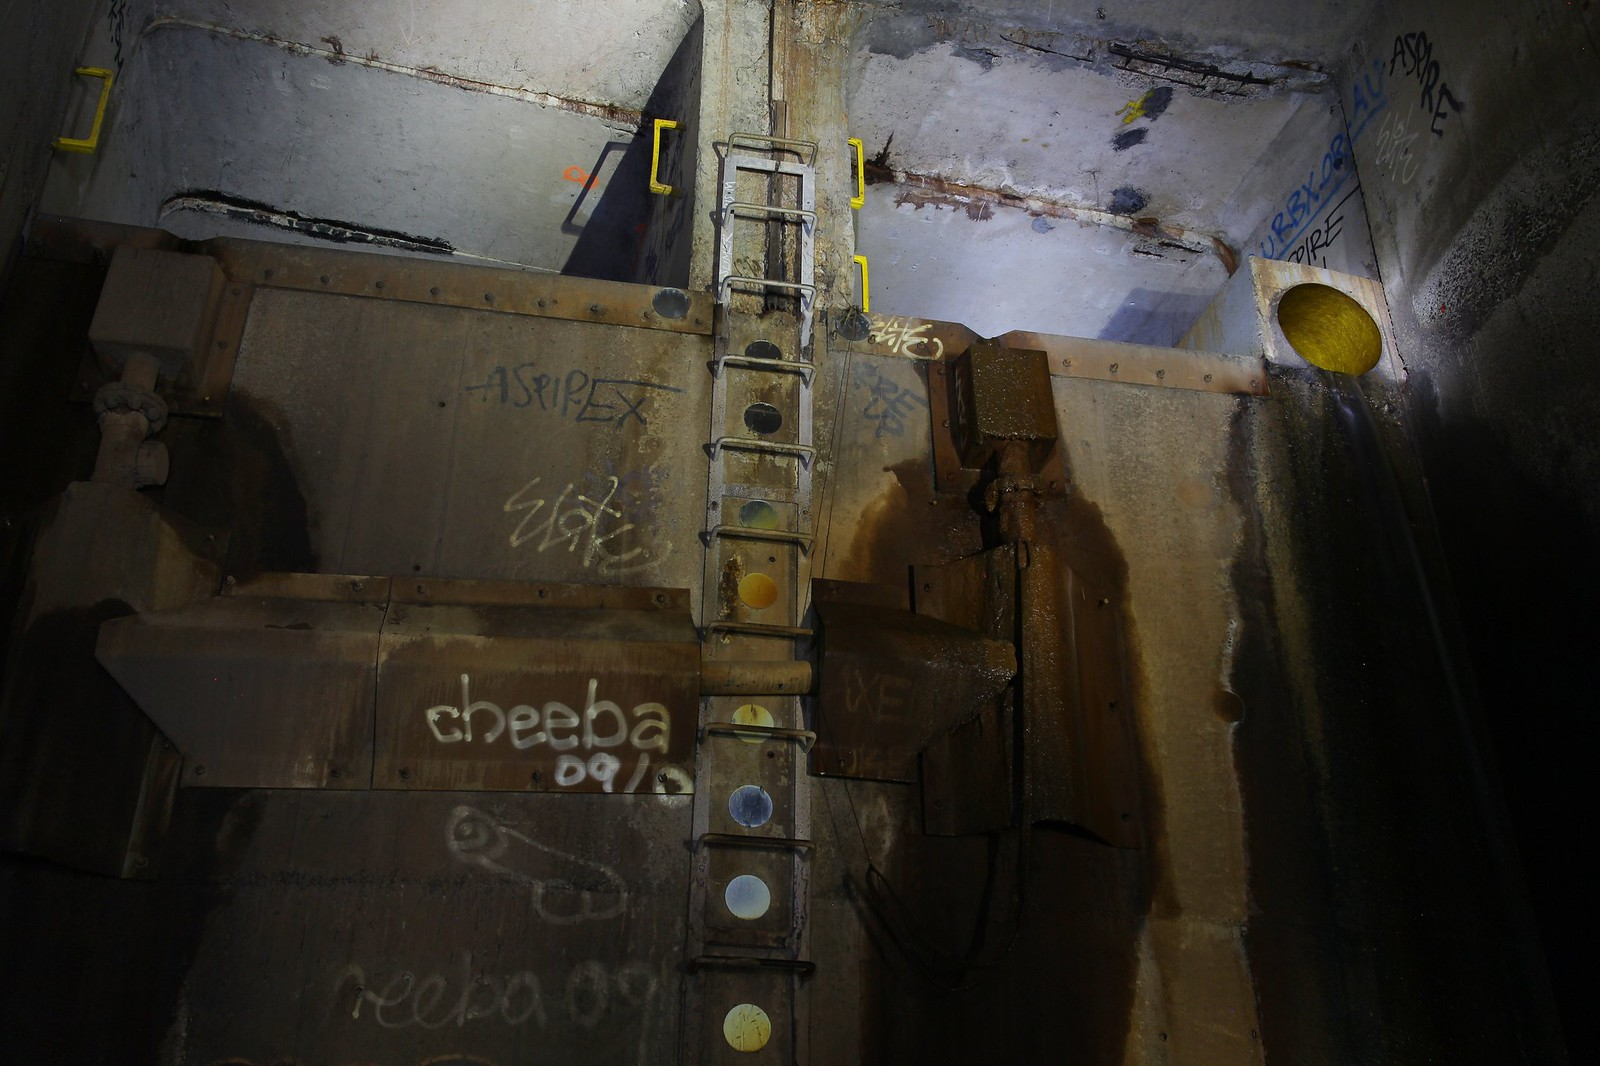 Hercules' Ladder